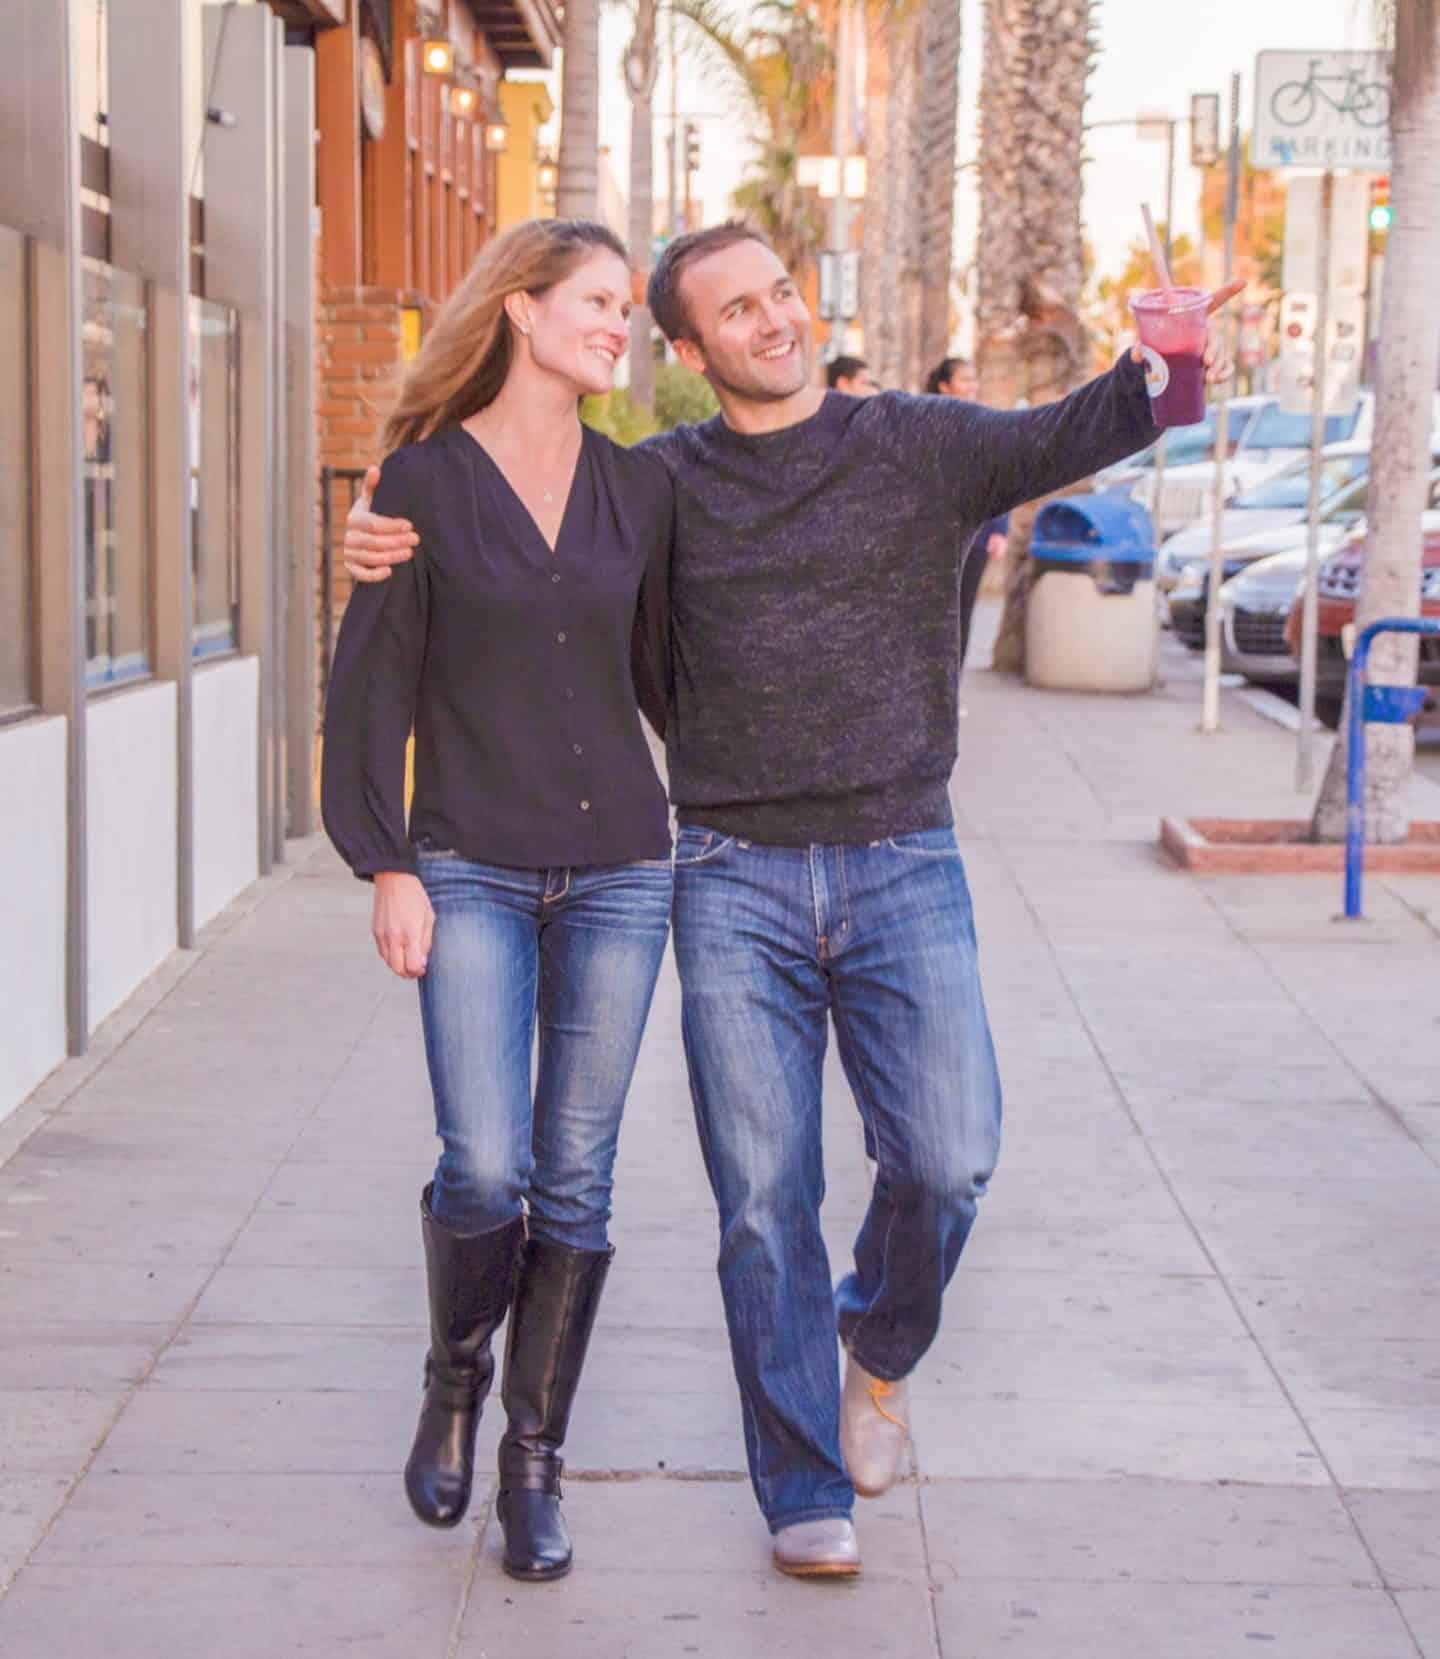 Shaunda Necole- One-On-One with Entrepreneurs On Fire John Lee Dumas & Kate Erickson of Kate's Take Podcast